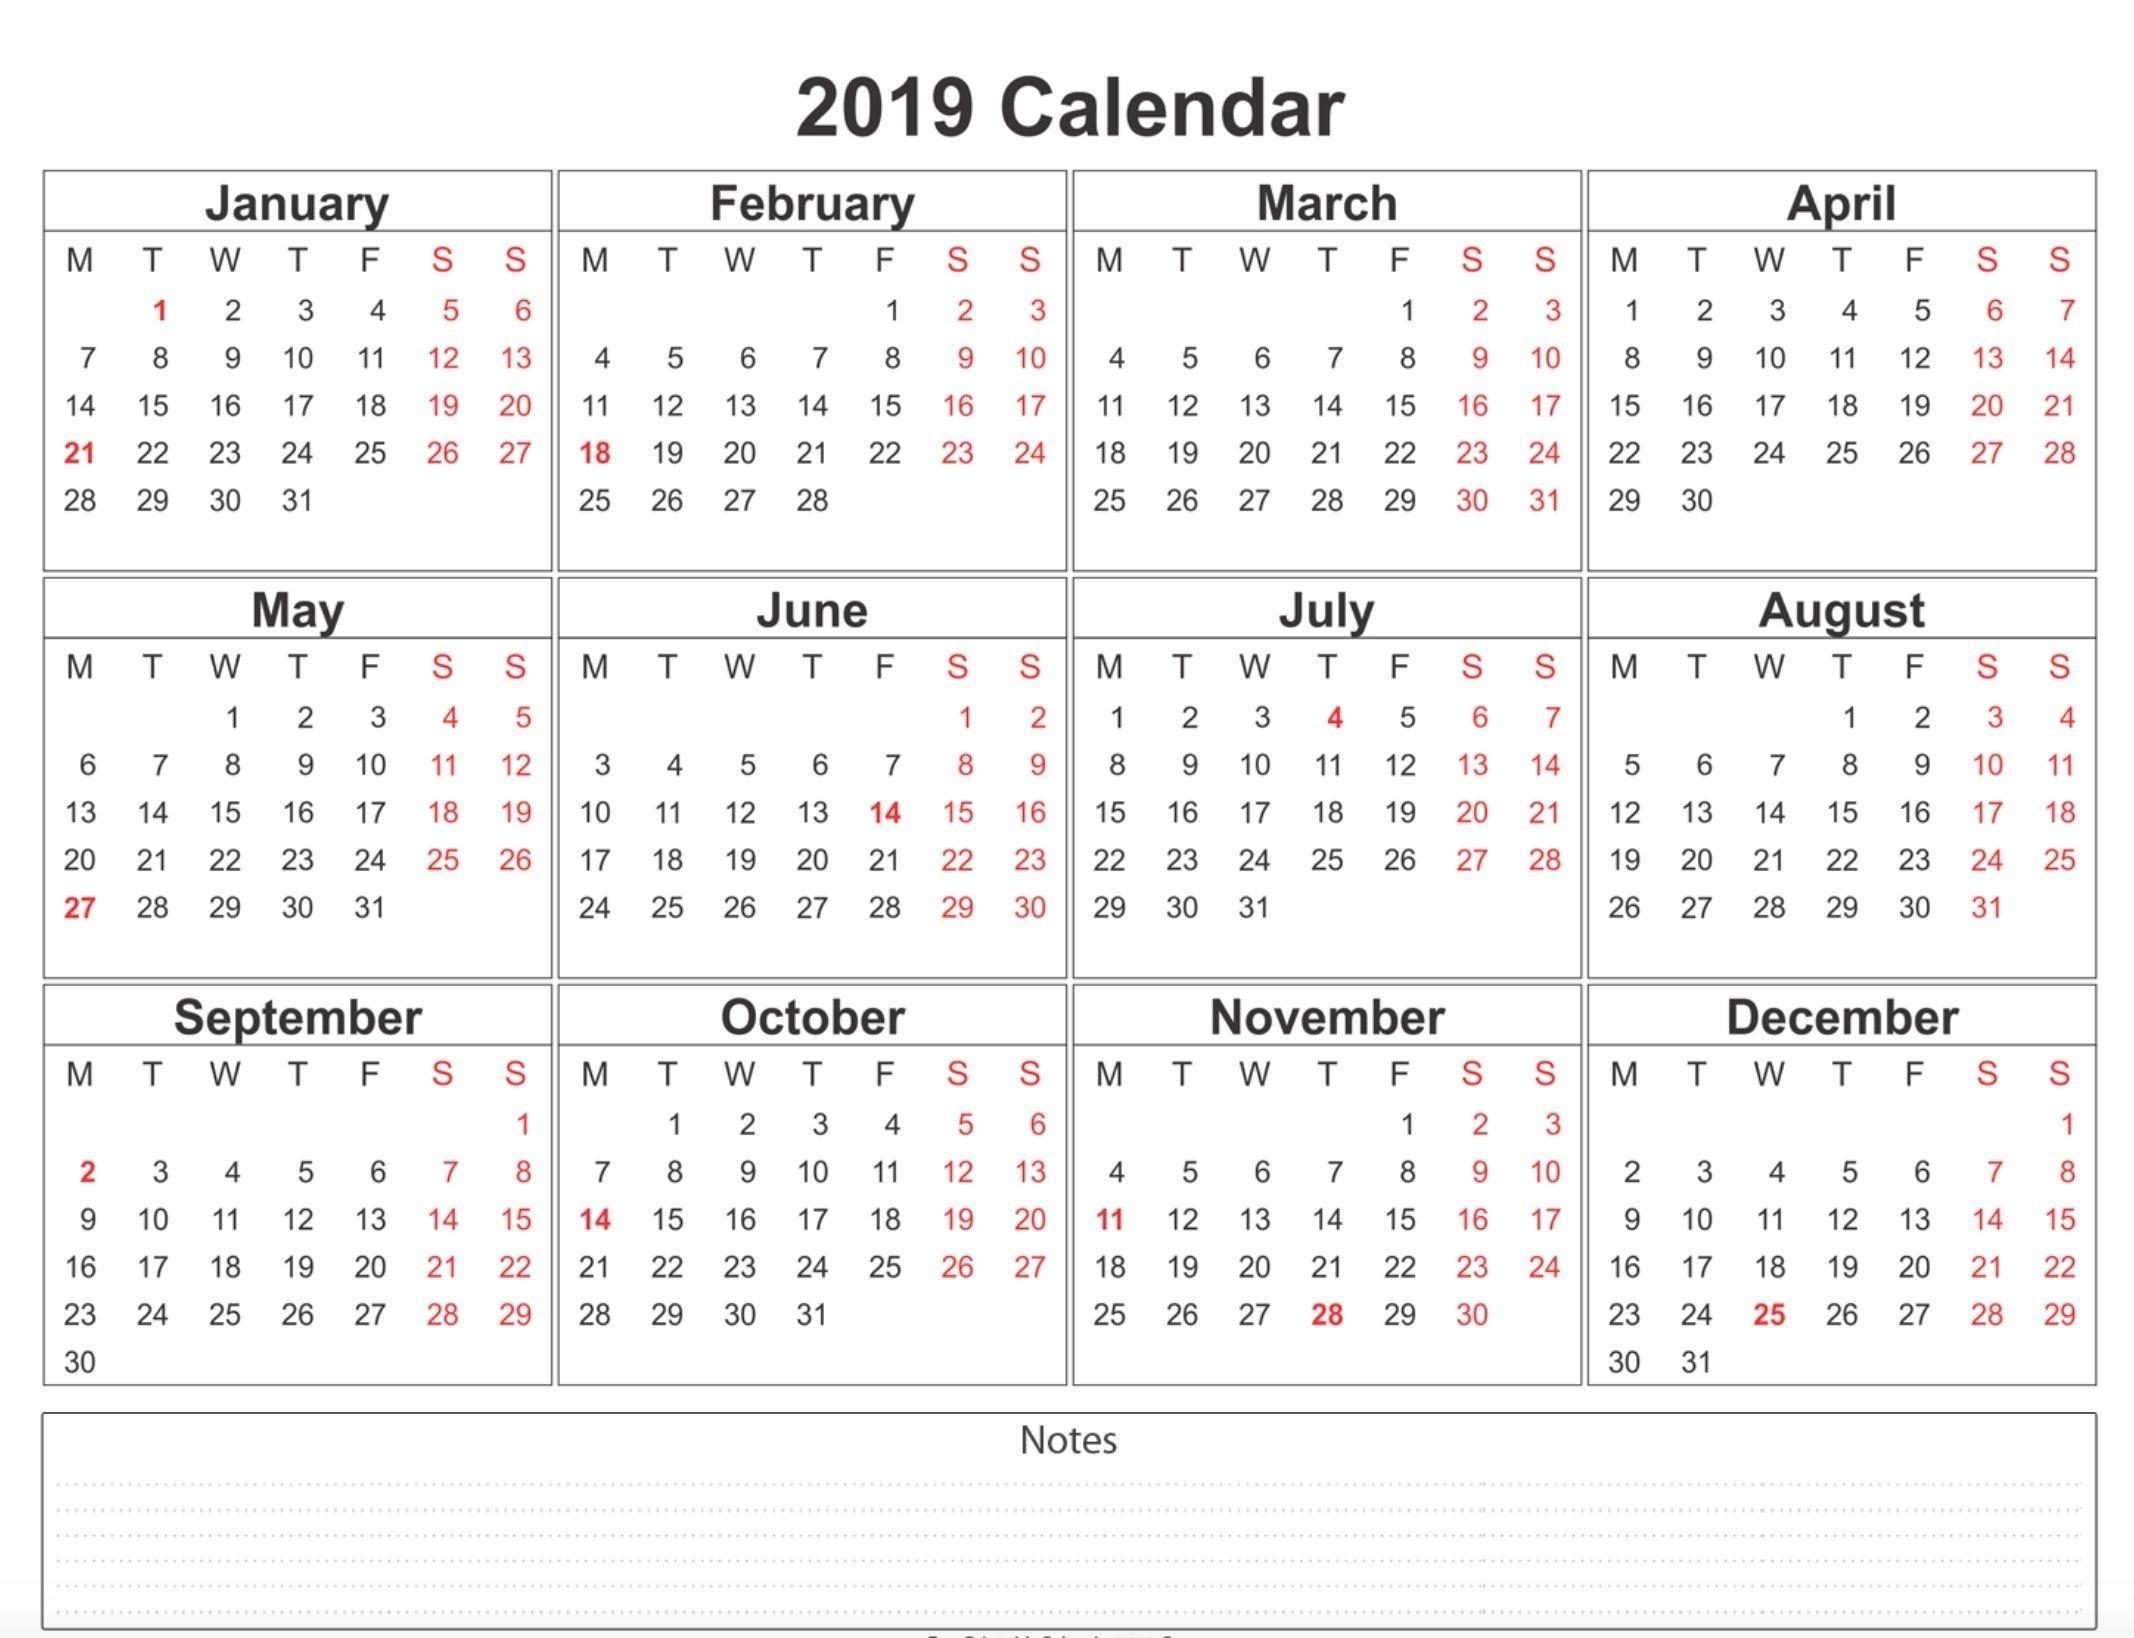 2019 Calendar Printable Free A4 Template | Weekly Calendar  12 Month Calendar Free Printable